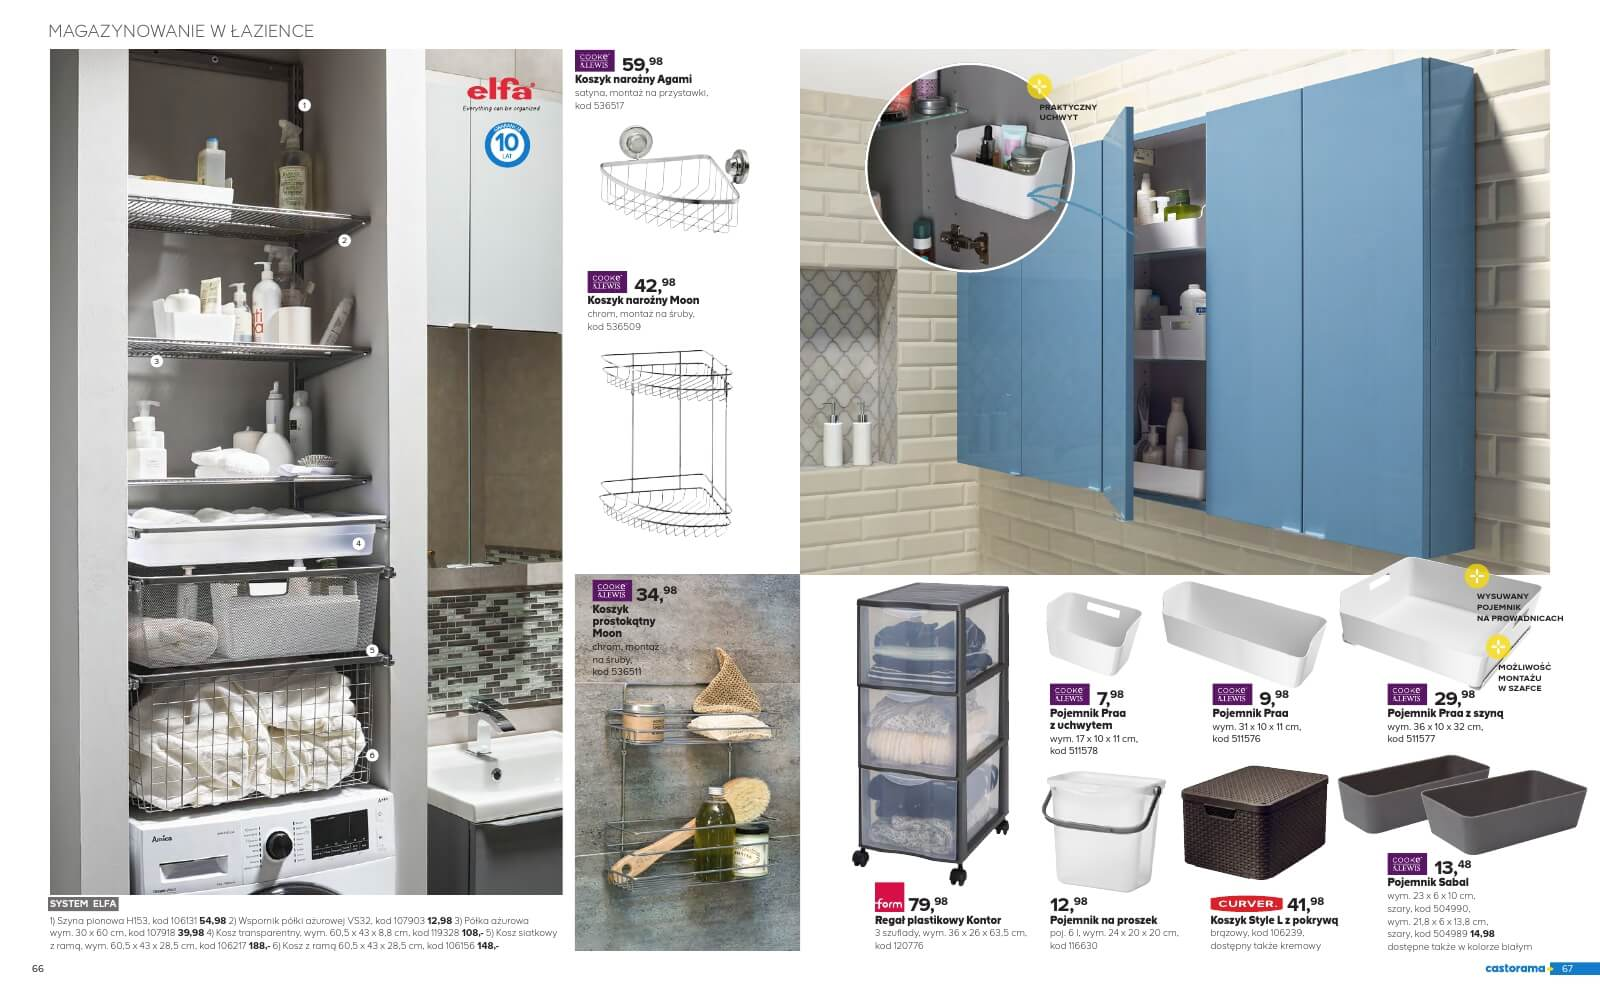 Castorama Katalog łazienka 2018 Str34